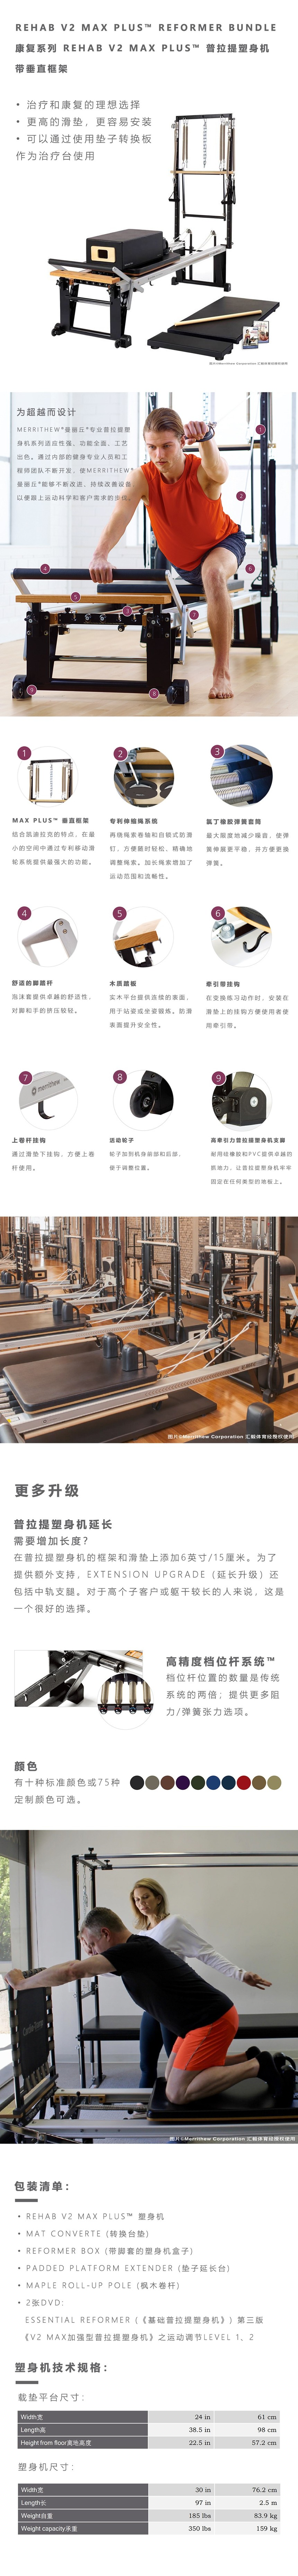 ST01085-康复系列 Rehab V2 Max Plus™ 普拉提塑身机带垂直框架.jpg